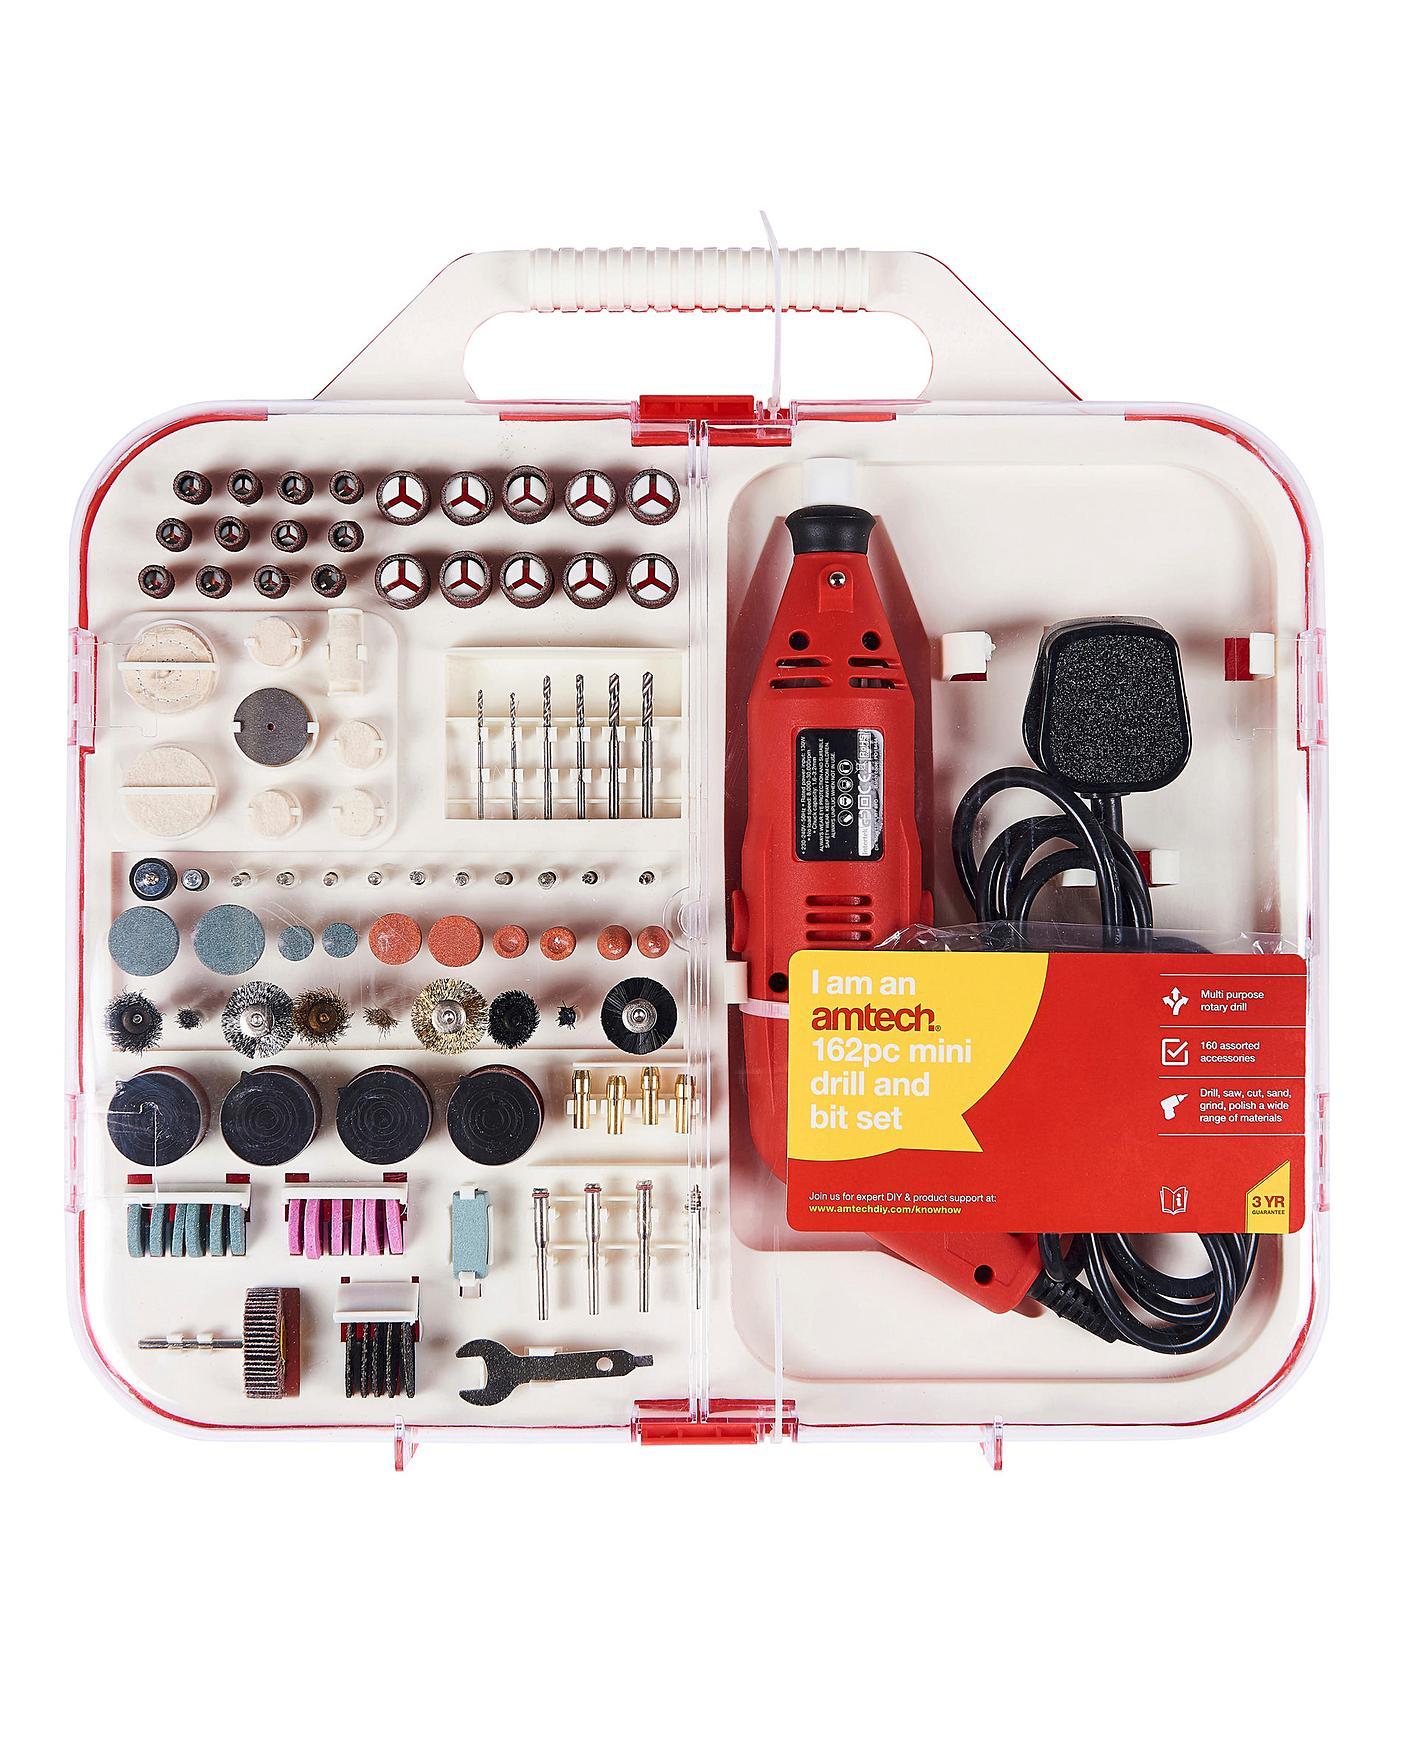 AmTech 162Pc Mini Drill & Bit Set